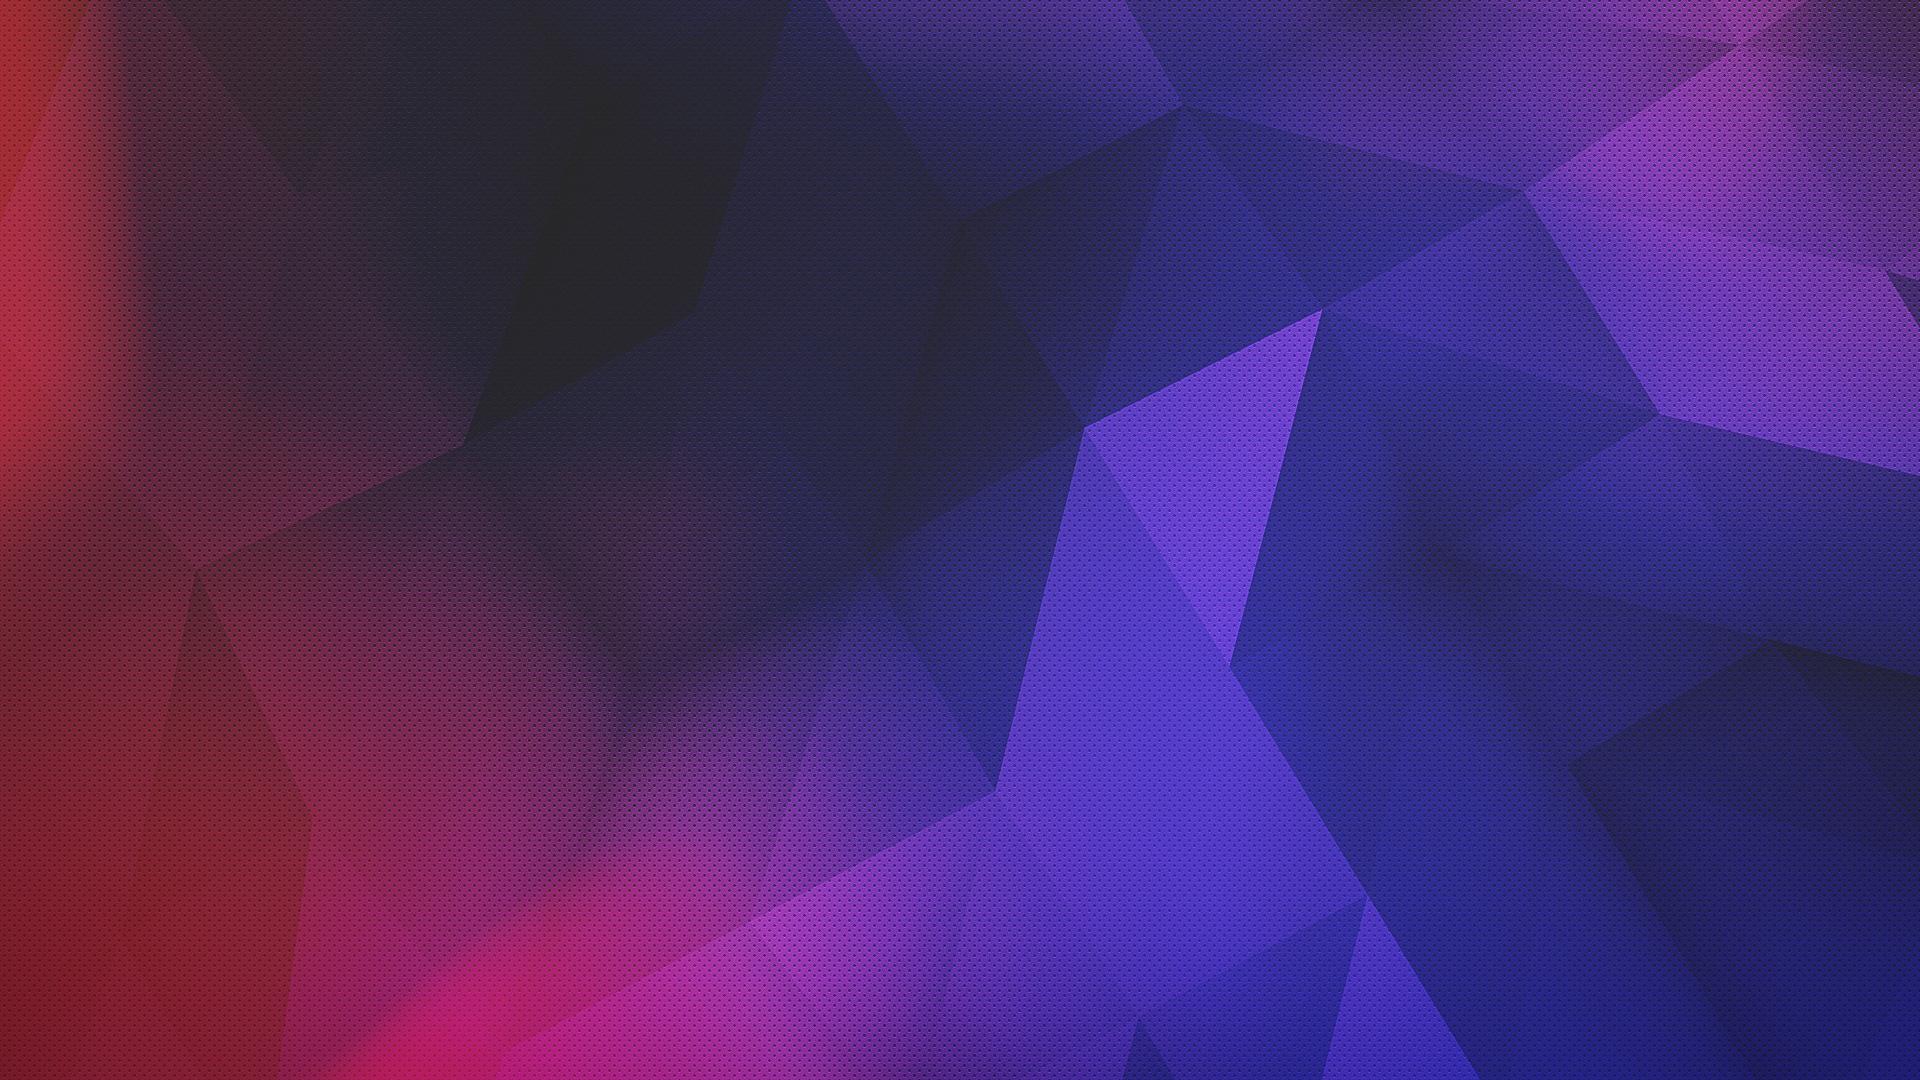 Purple Geometric Wallpapers   Top Purple Geometric 1920x1080